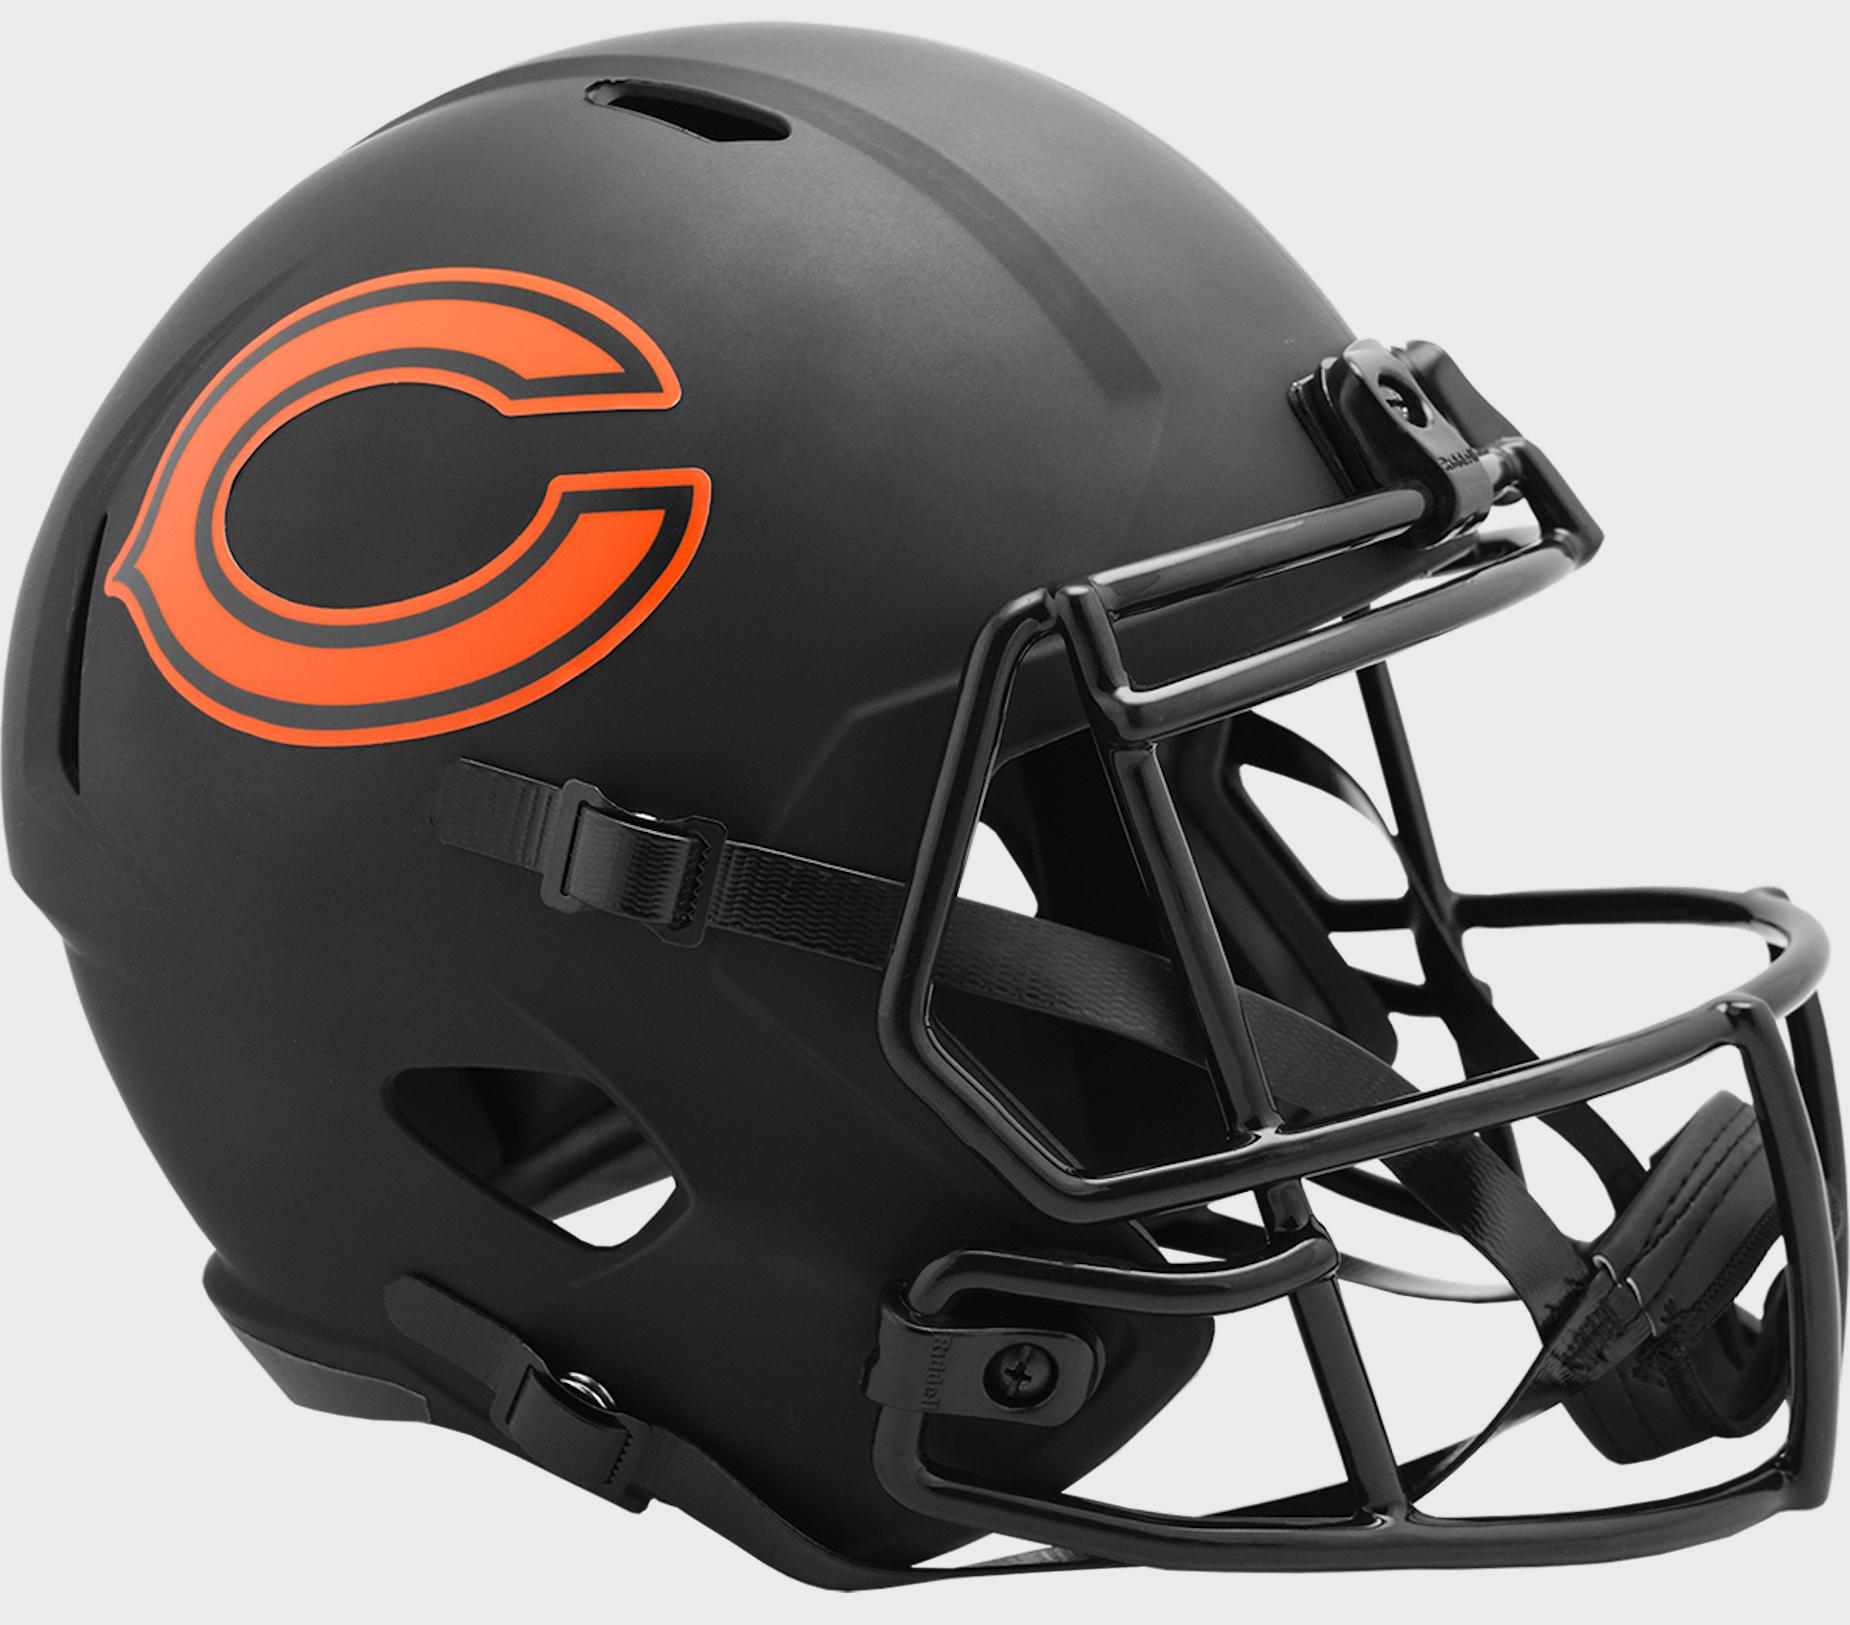 Chicago Bears Speed Replica Football Helmet <B>ECLIPSE</B>